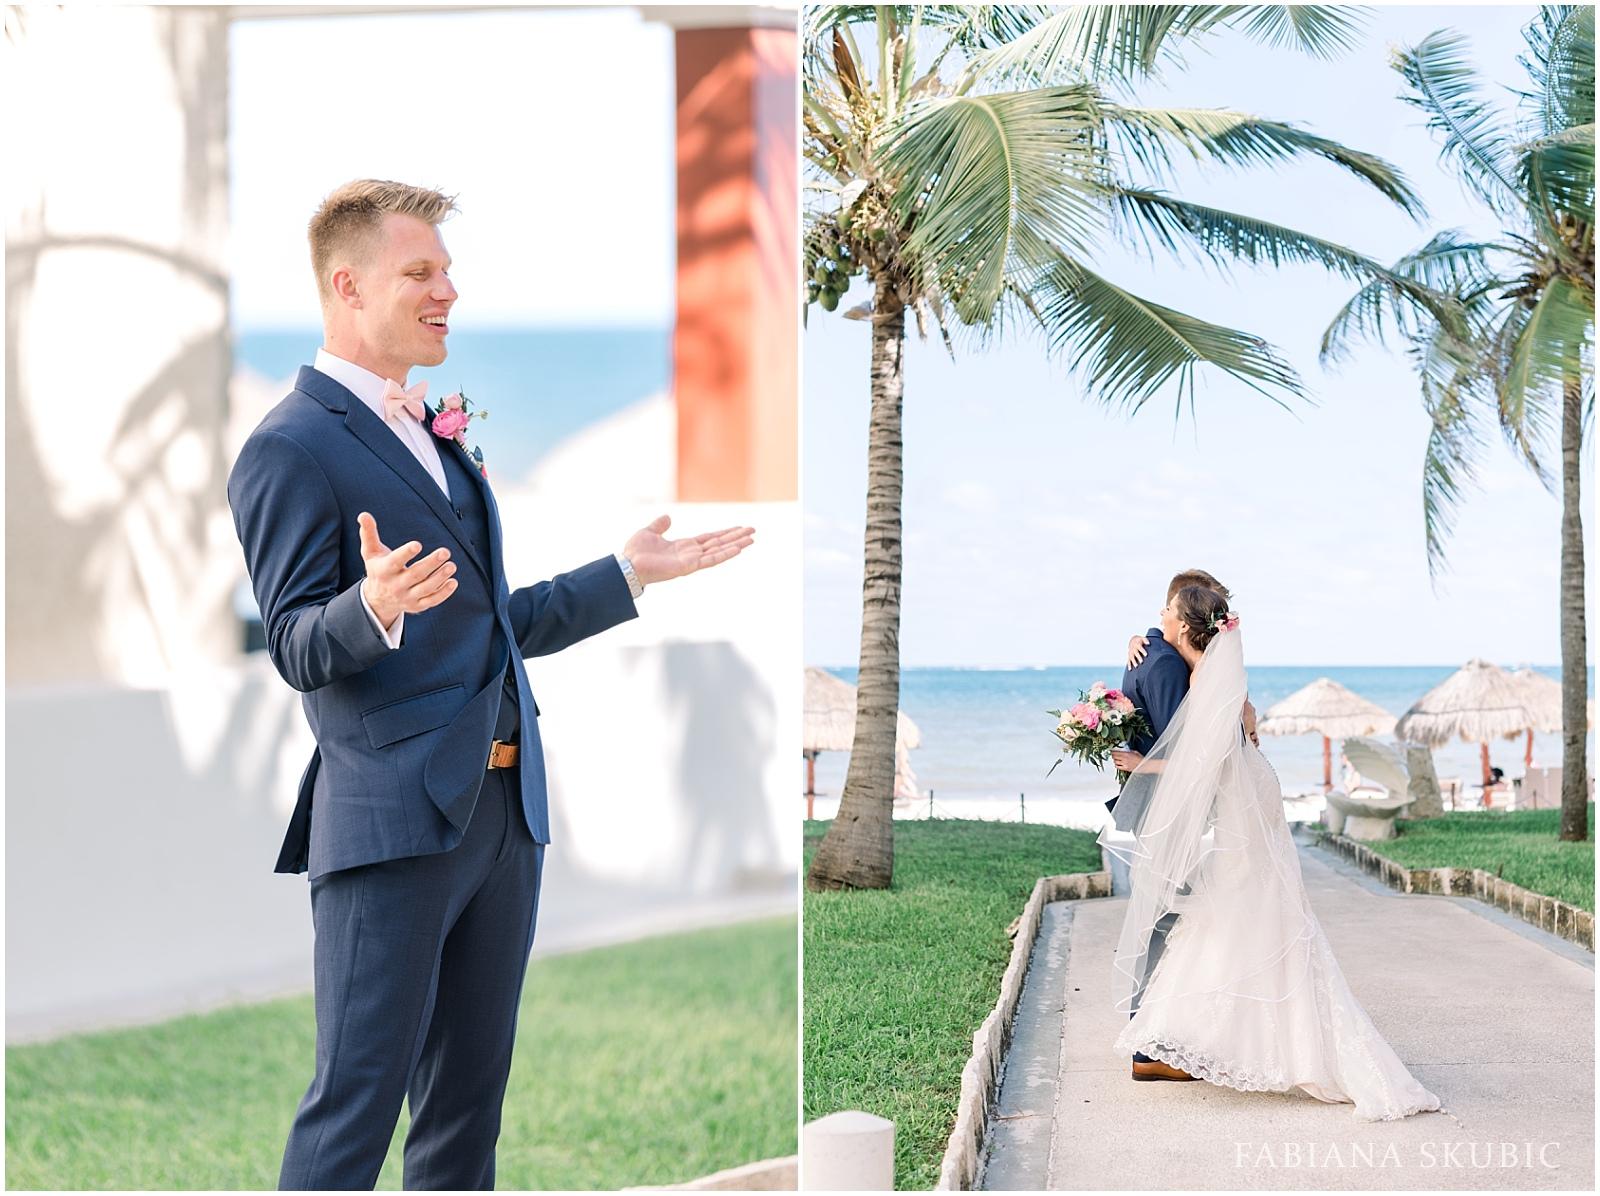 TJ_Now_Sapphire_Riviera_Cancun_Mexico_Wedding_Photos_0193.jpg